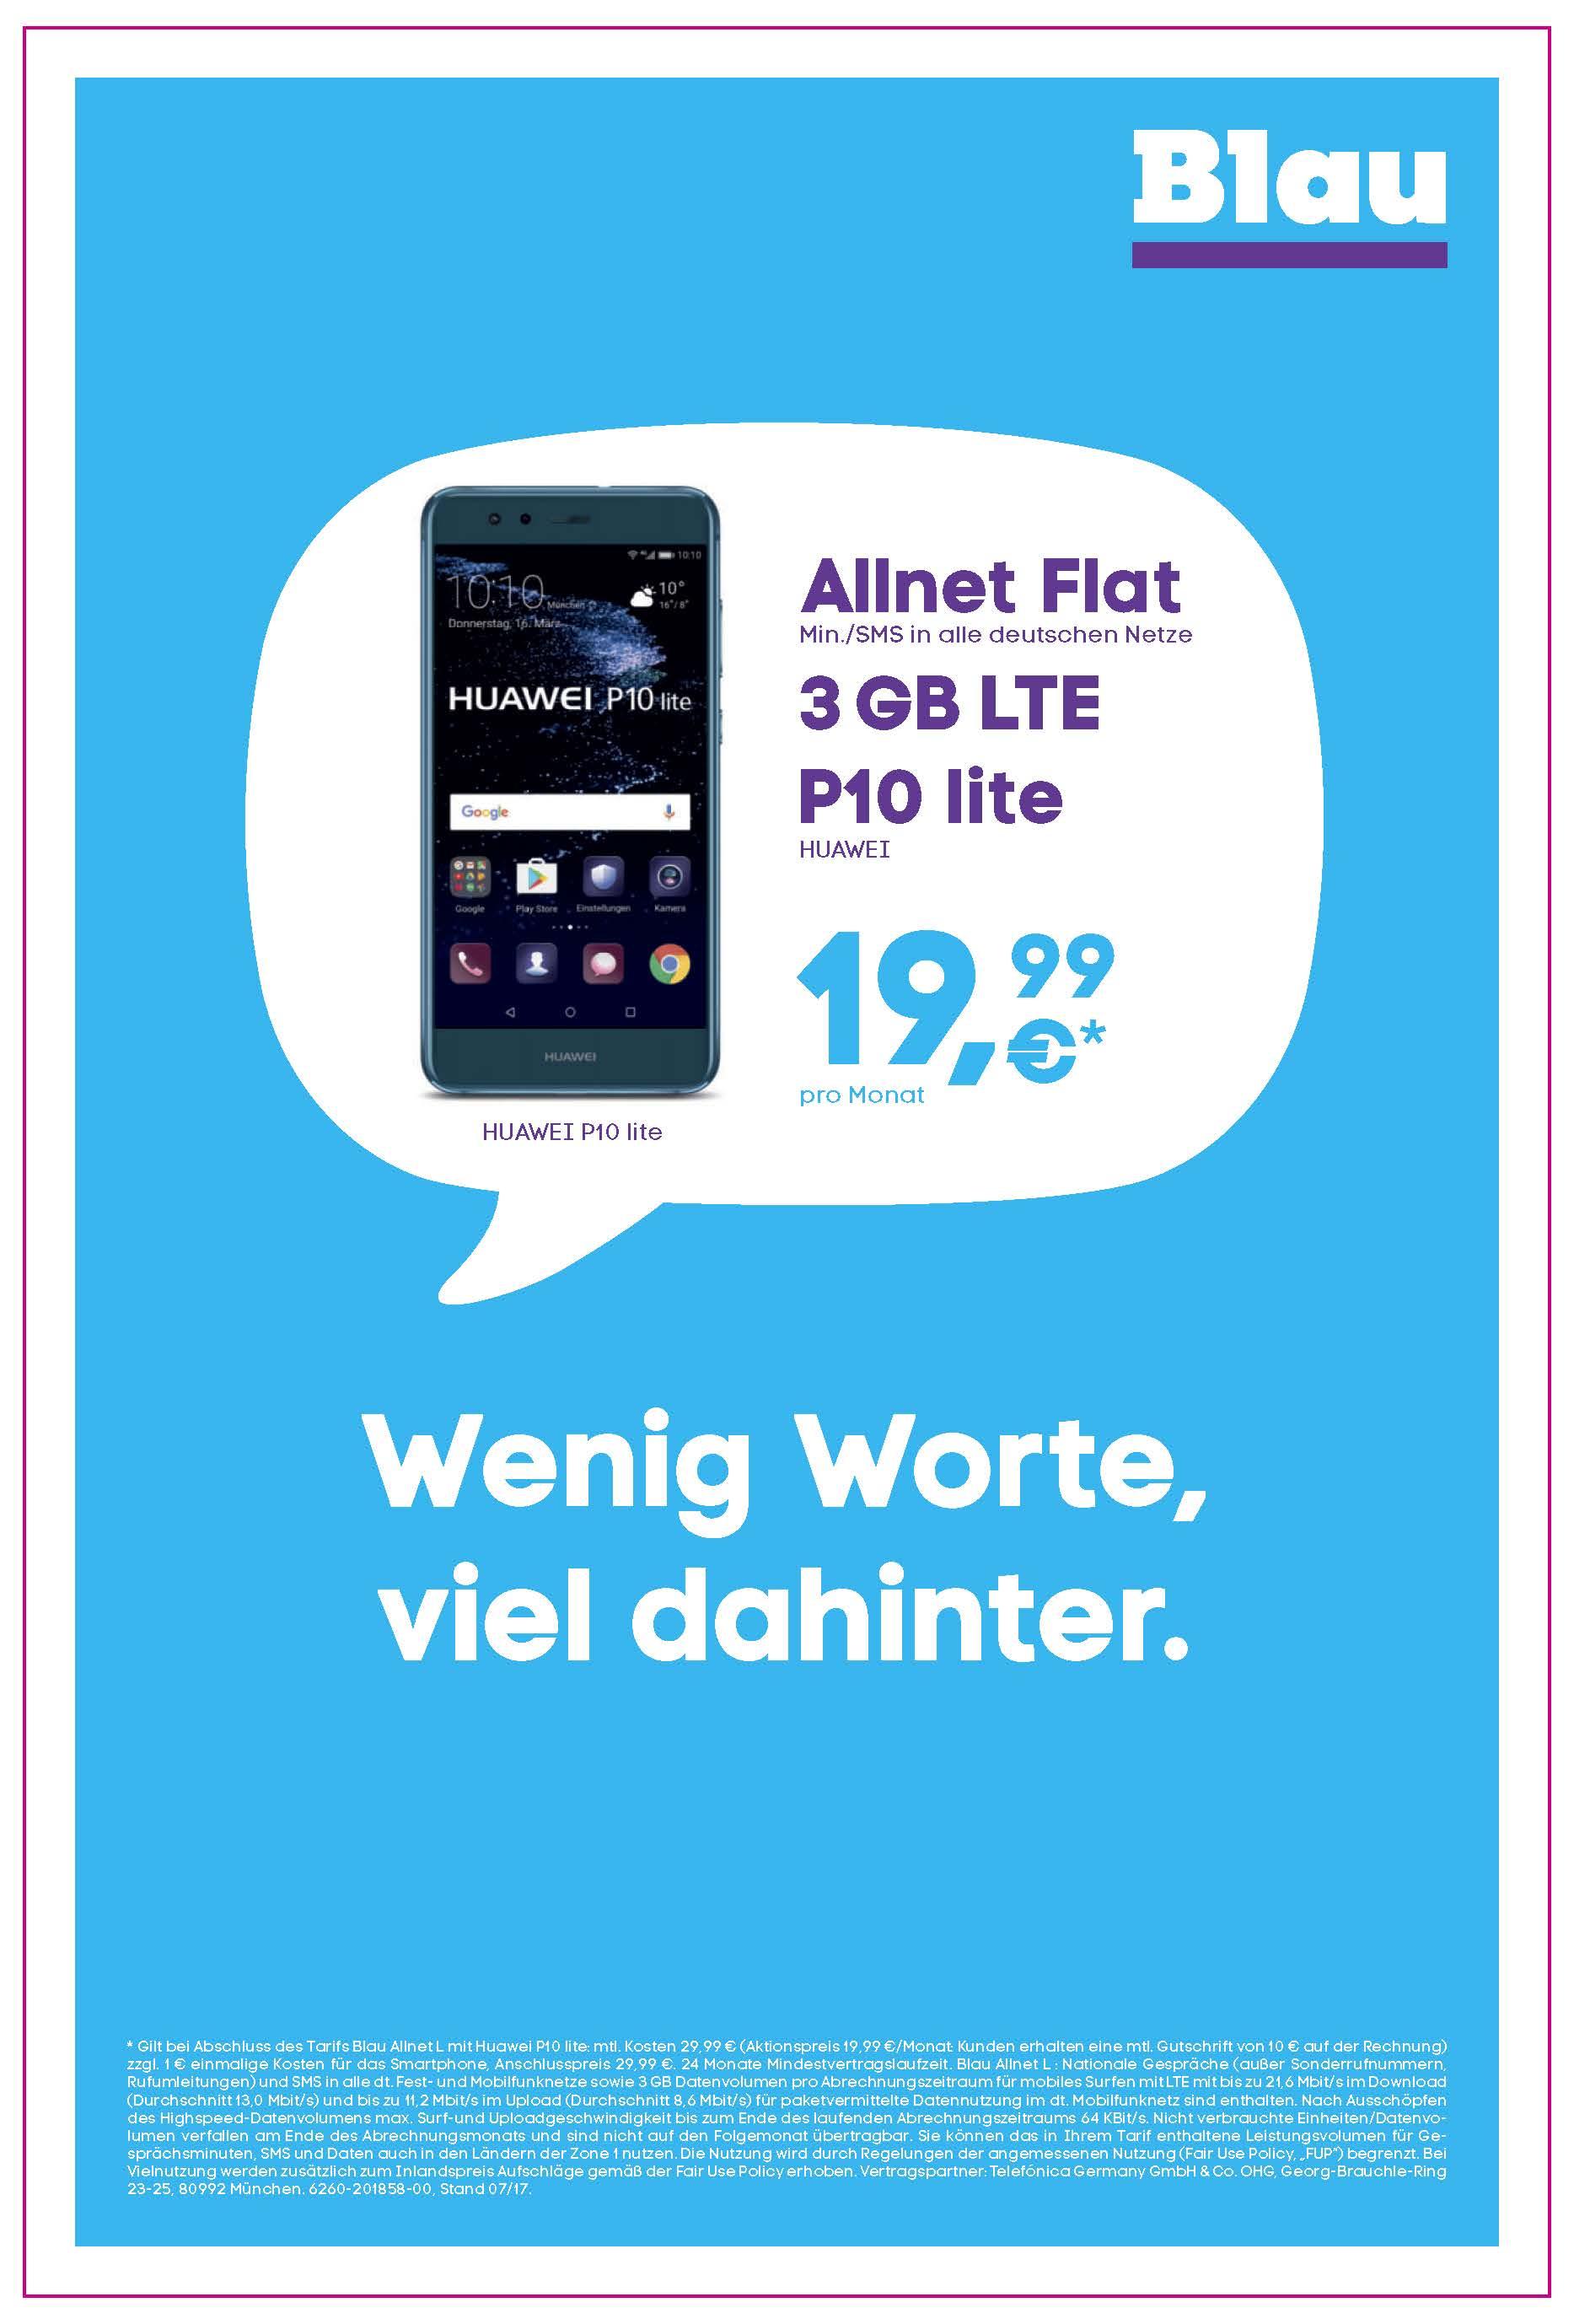 BLAU_OoH_Allnetflat_Huawei_P10_lite_CLP_M1730001_F39_150dpi_netto[1]_Seite_4.jpg